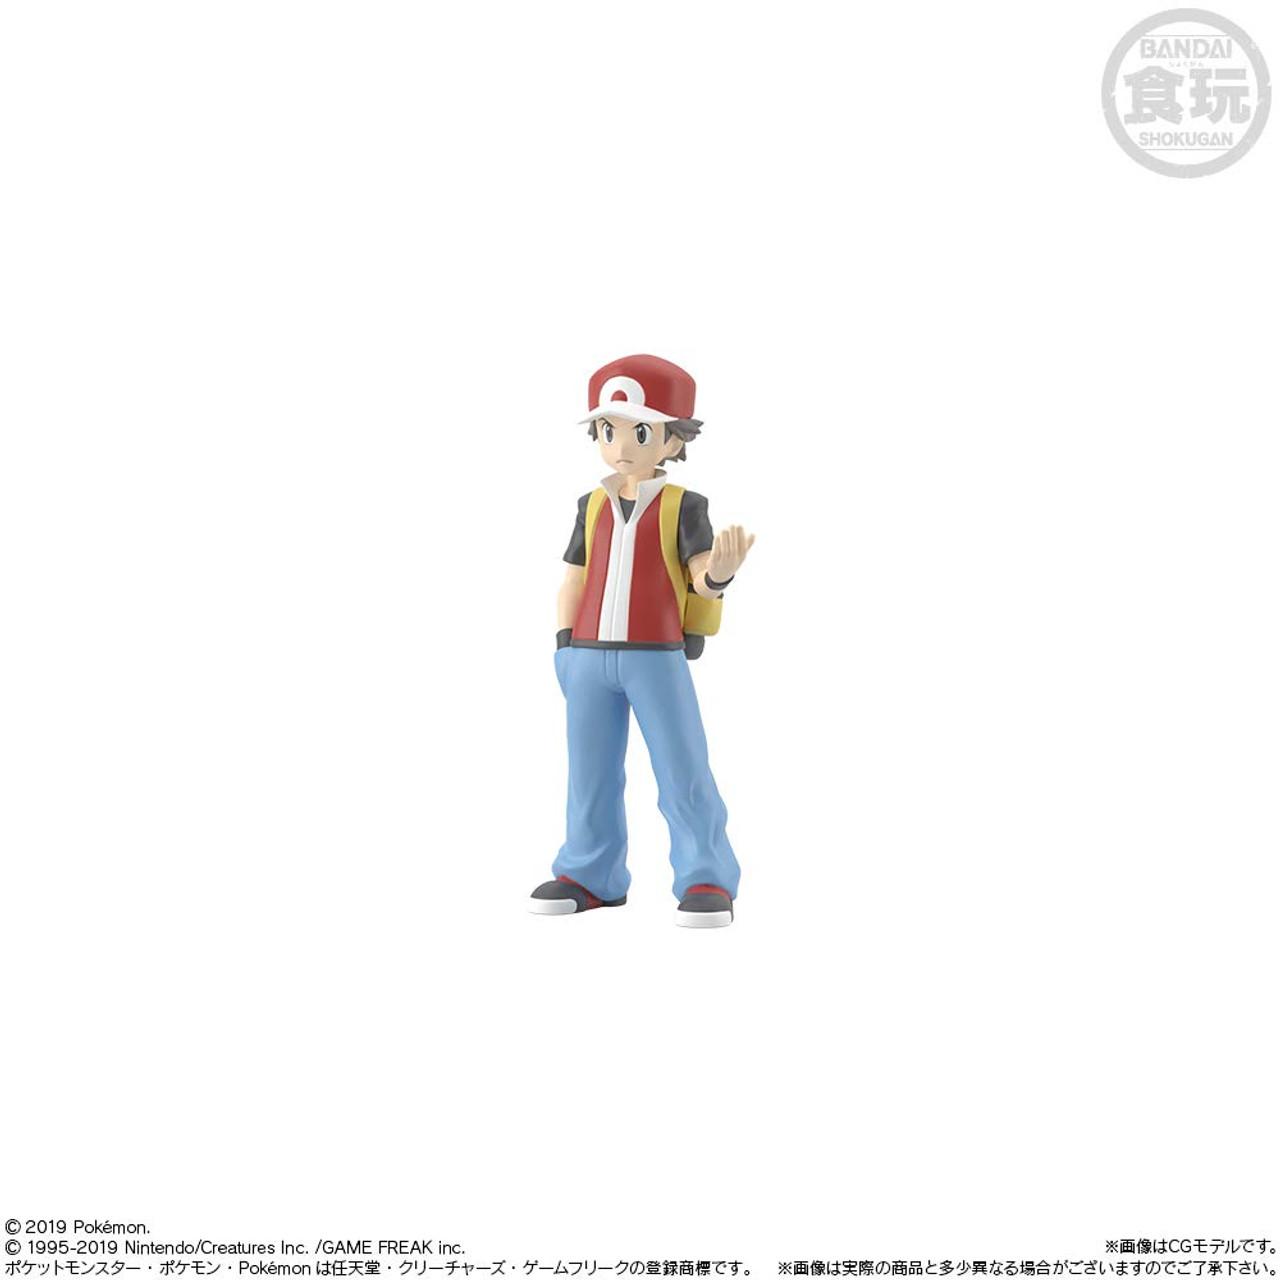 Scale World Bandai Pokemon Center Japan Wartortle /& Eevee Kanto 1st ed